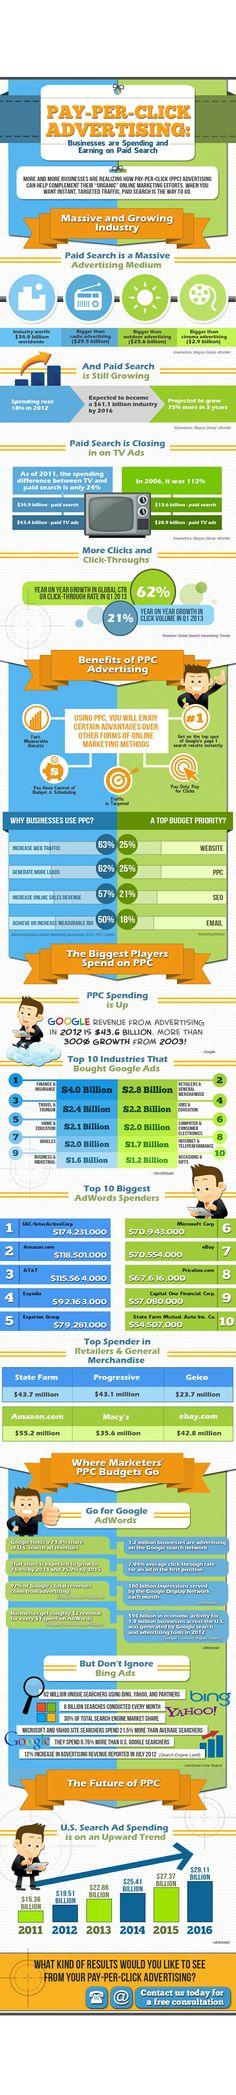 Infographic PPC Purpose Advertising